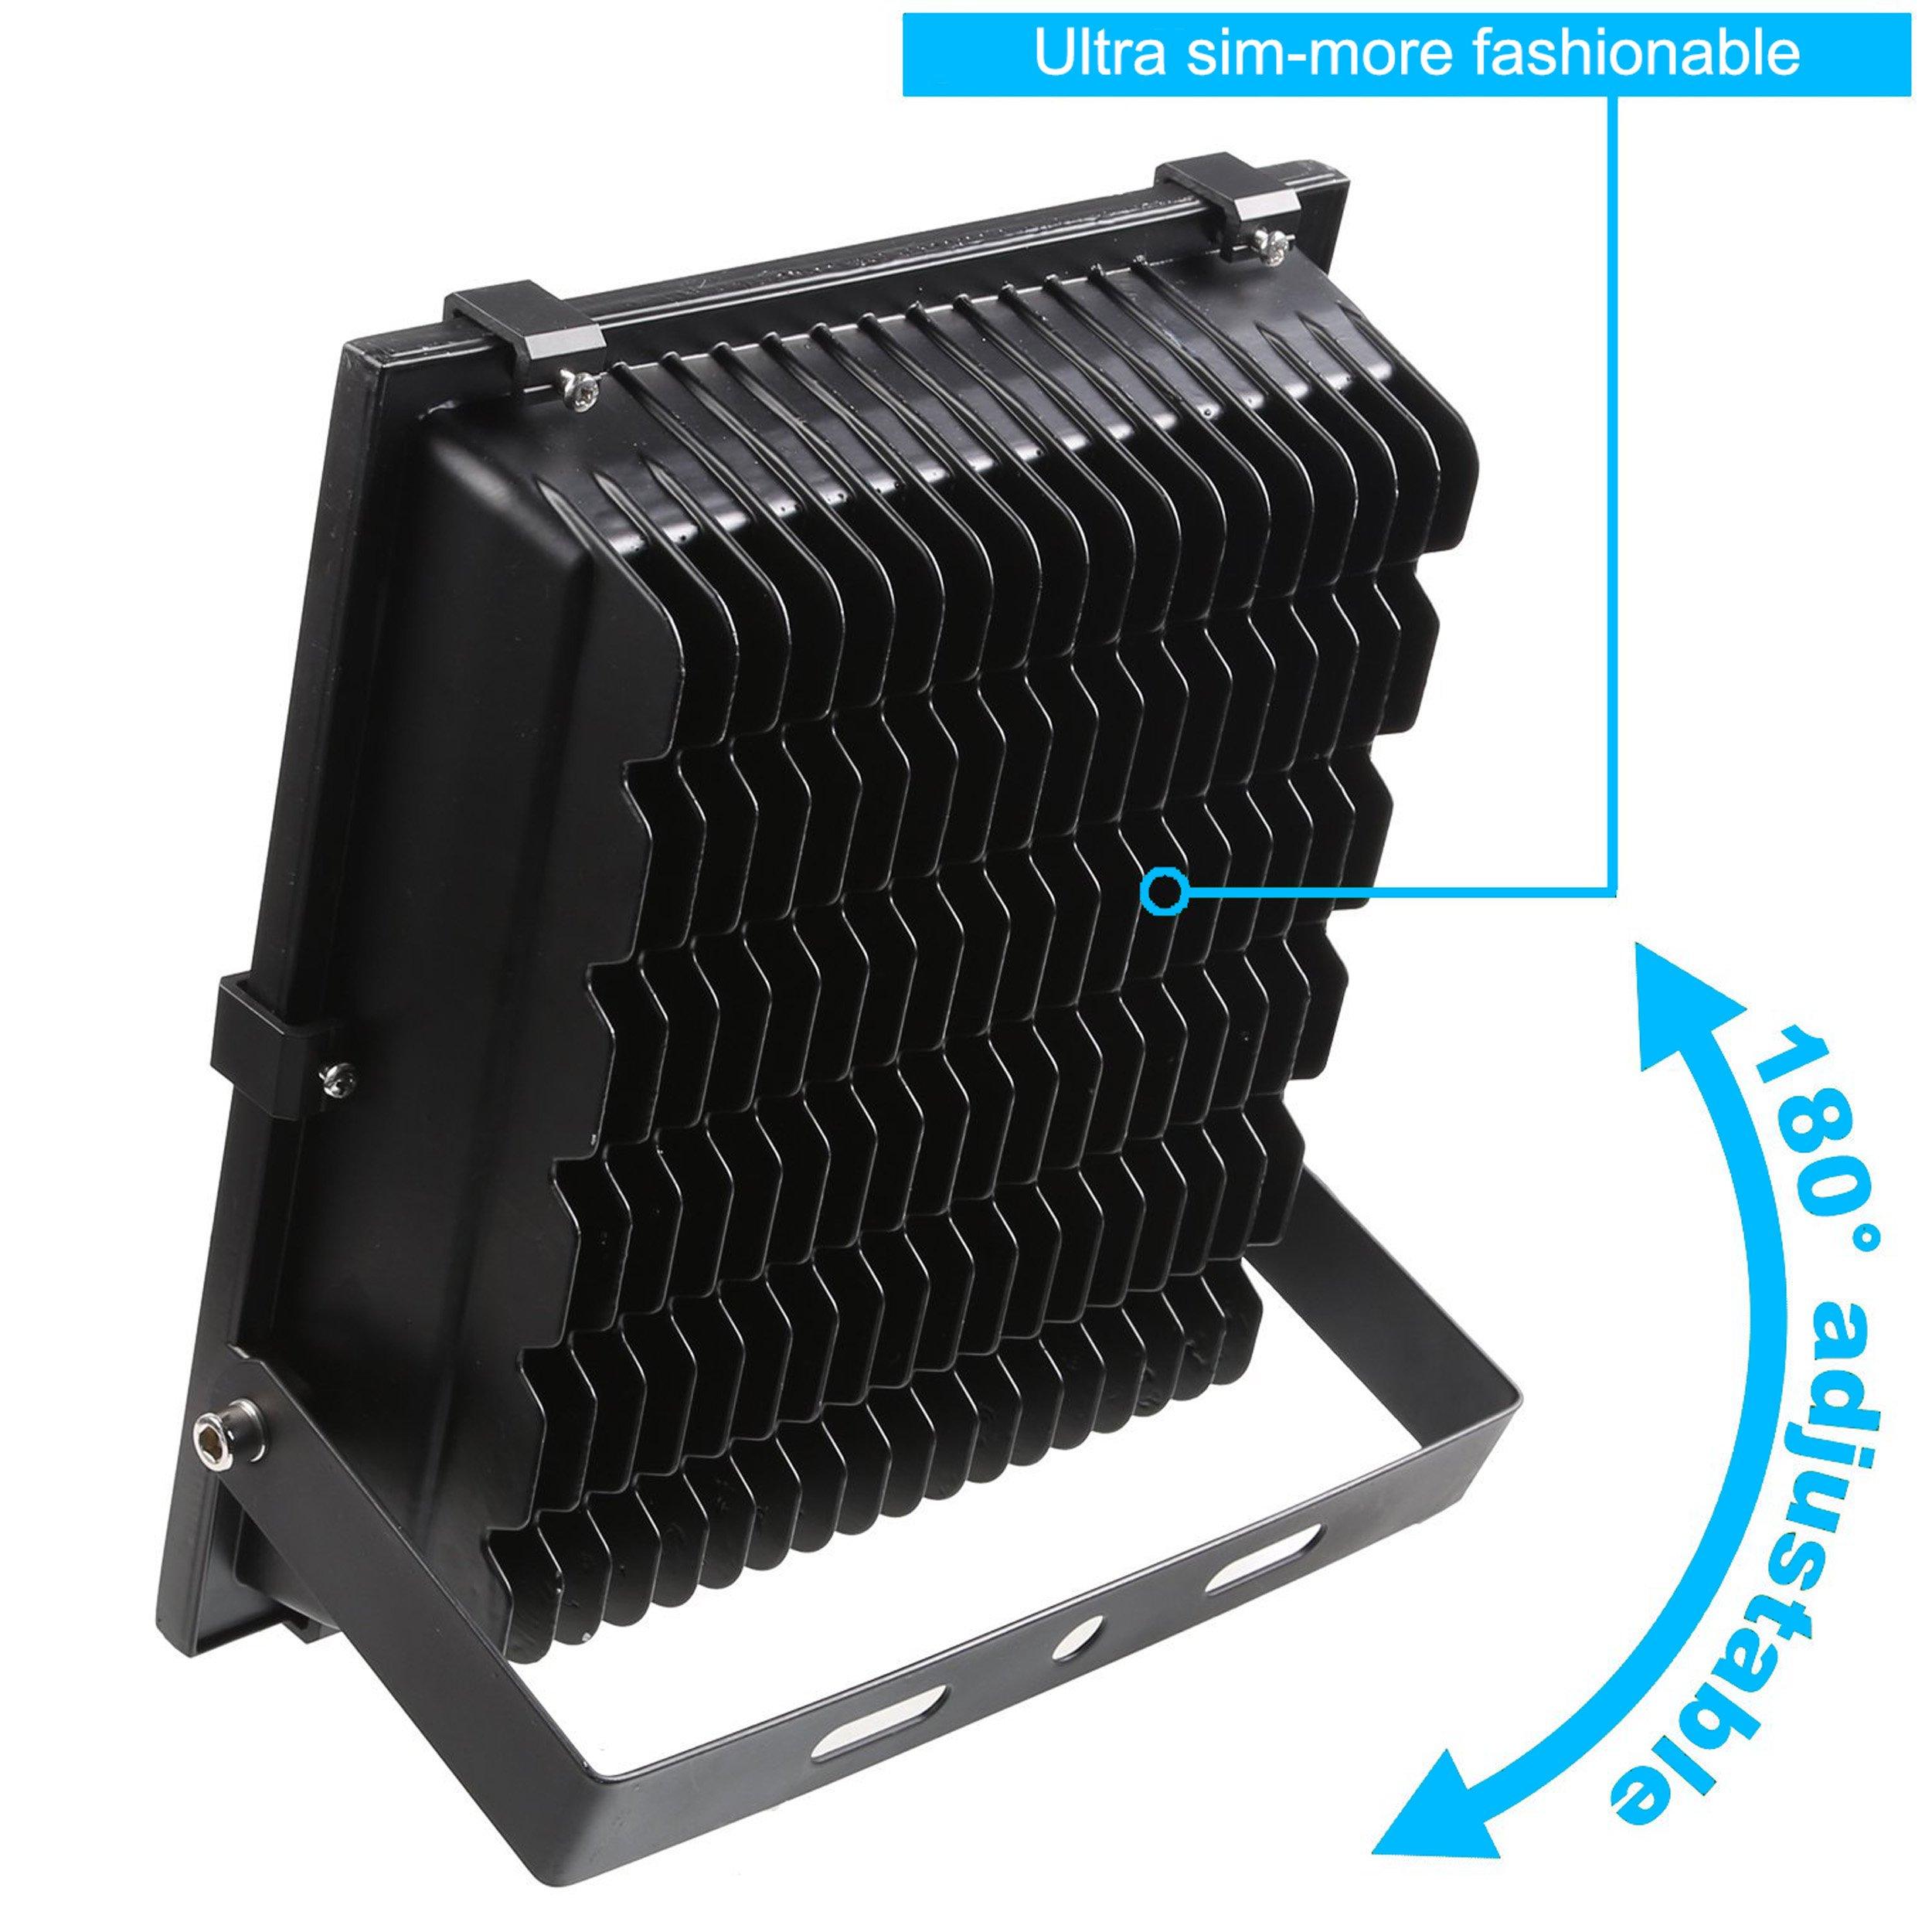 100 Watt Waterproof Spotlight LED 120 Volt 13000 Lumens 120 Degree Beam Angle 180 Degree Adjustable Angle 5500K Dayliht White Grow, 10.43 x 3.51 x 11.61 In (4 pack )